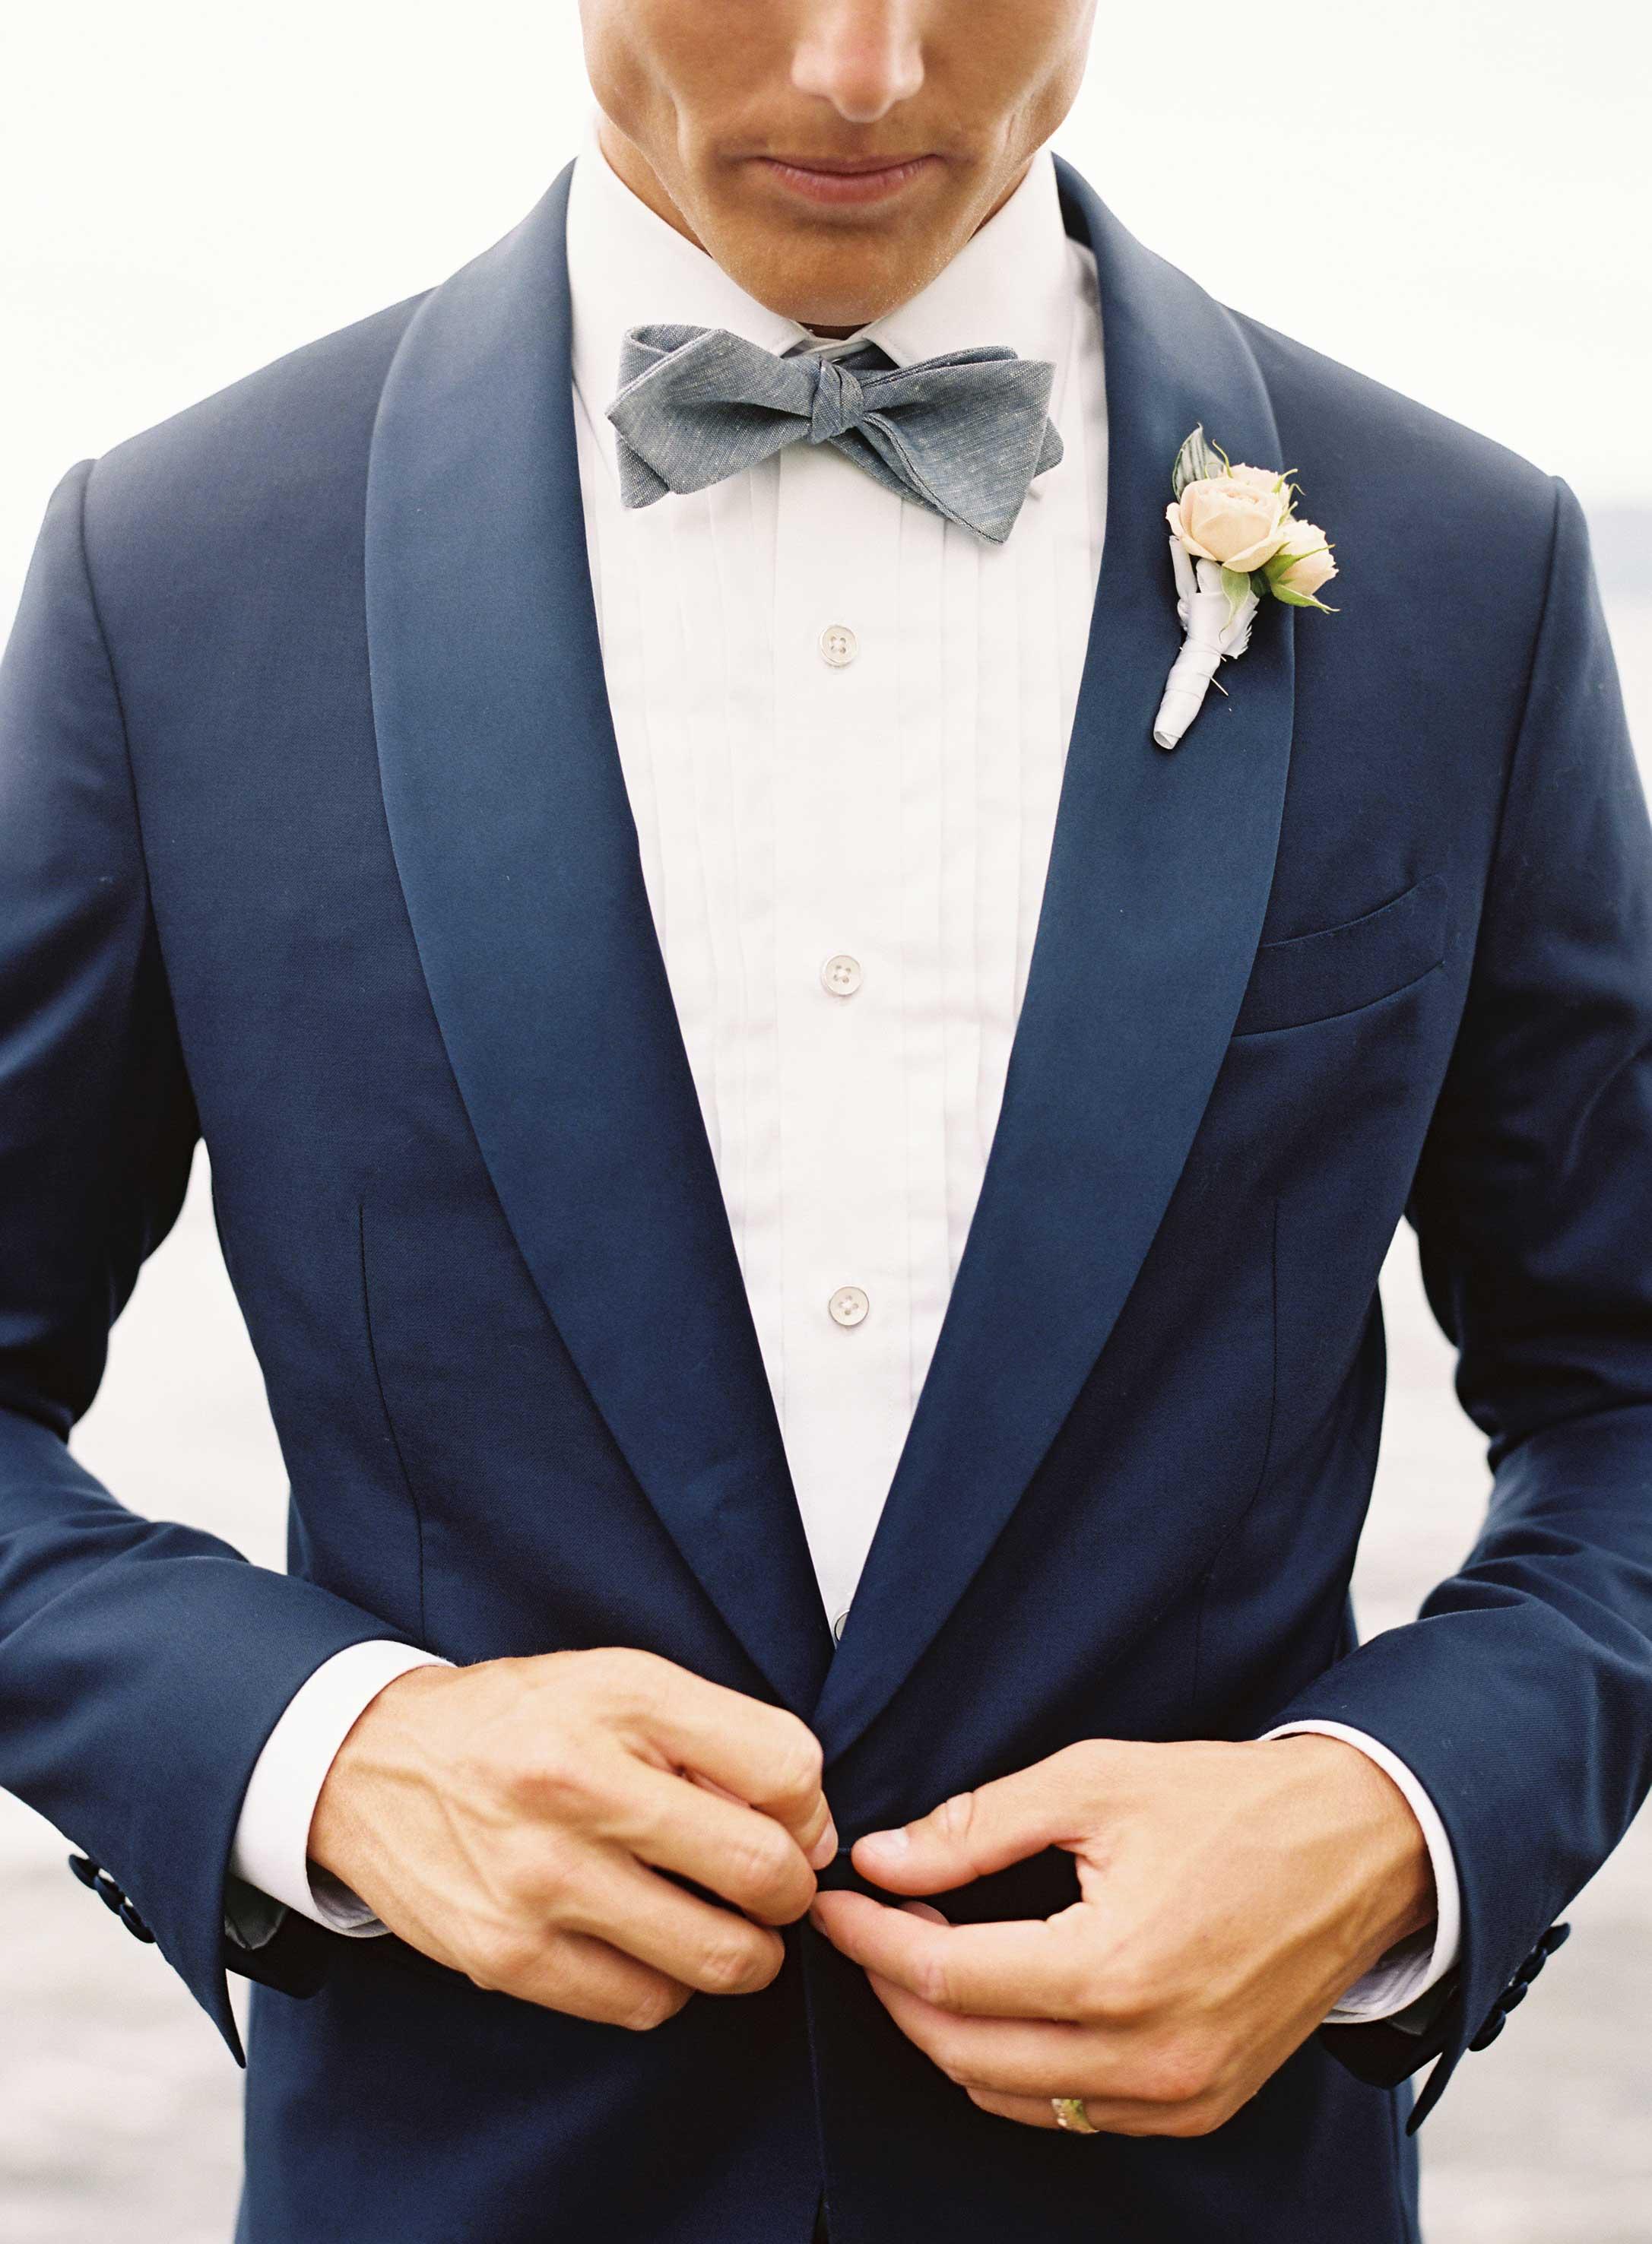 bryce harper wedding groom inspiration navy suit blue bow tie